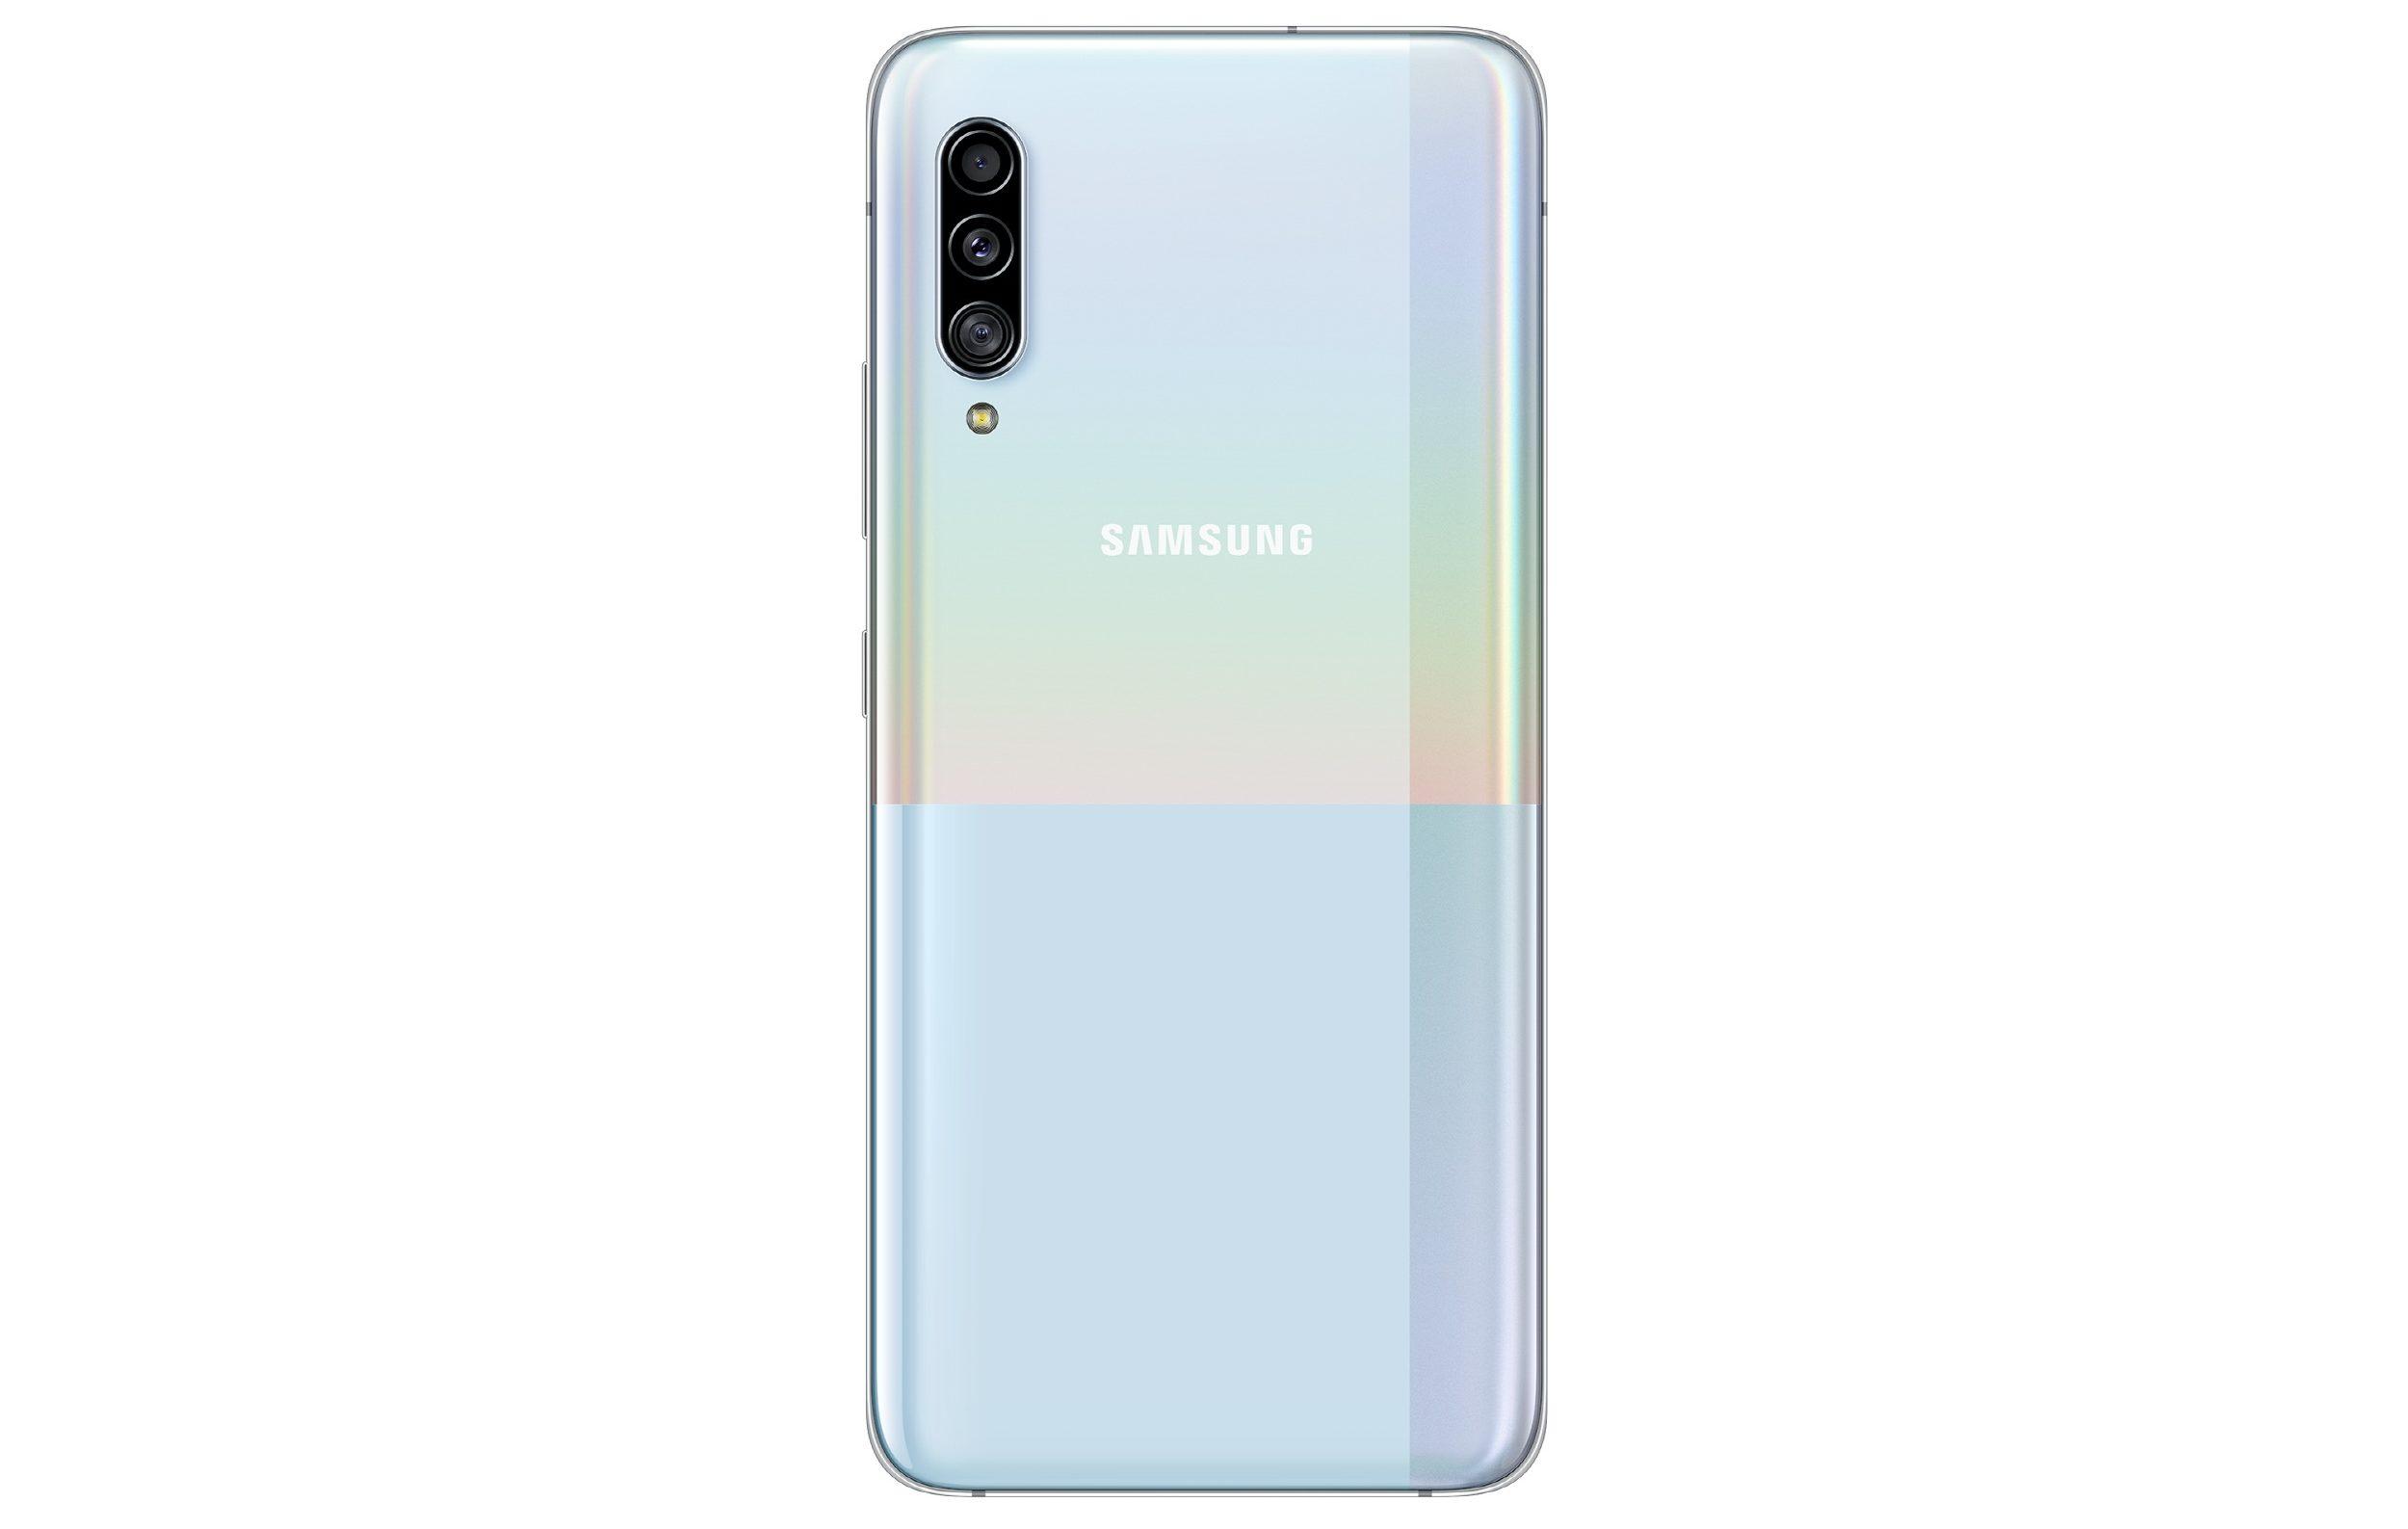 Galaxy A90 5G: تقدم Samsung توصيل الجيل التالي من الجيل الخامس بتقنية النطاق 5 رينجرز 1